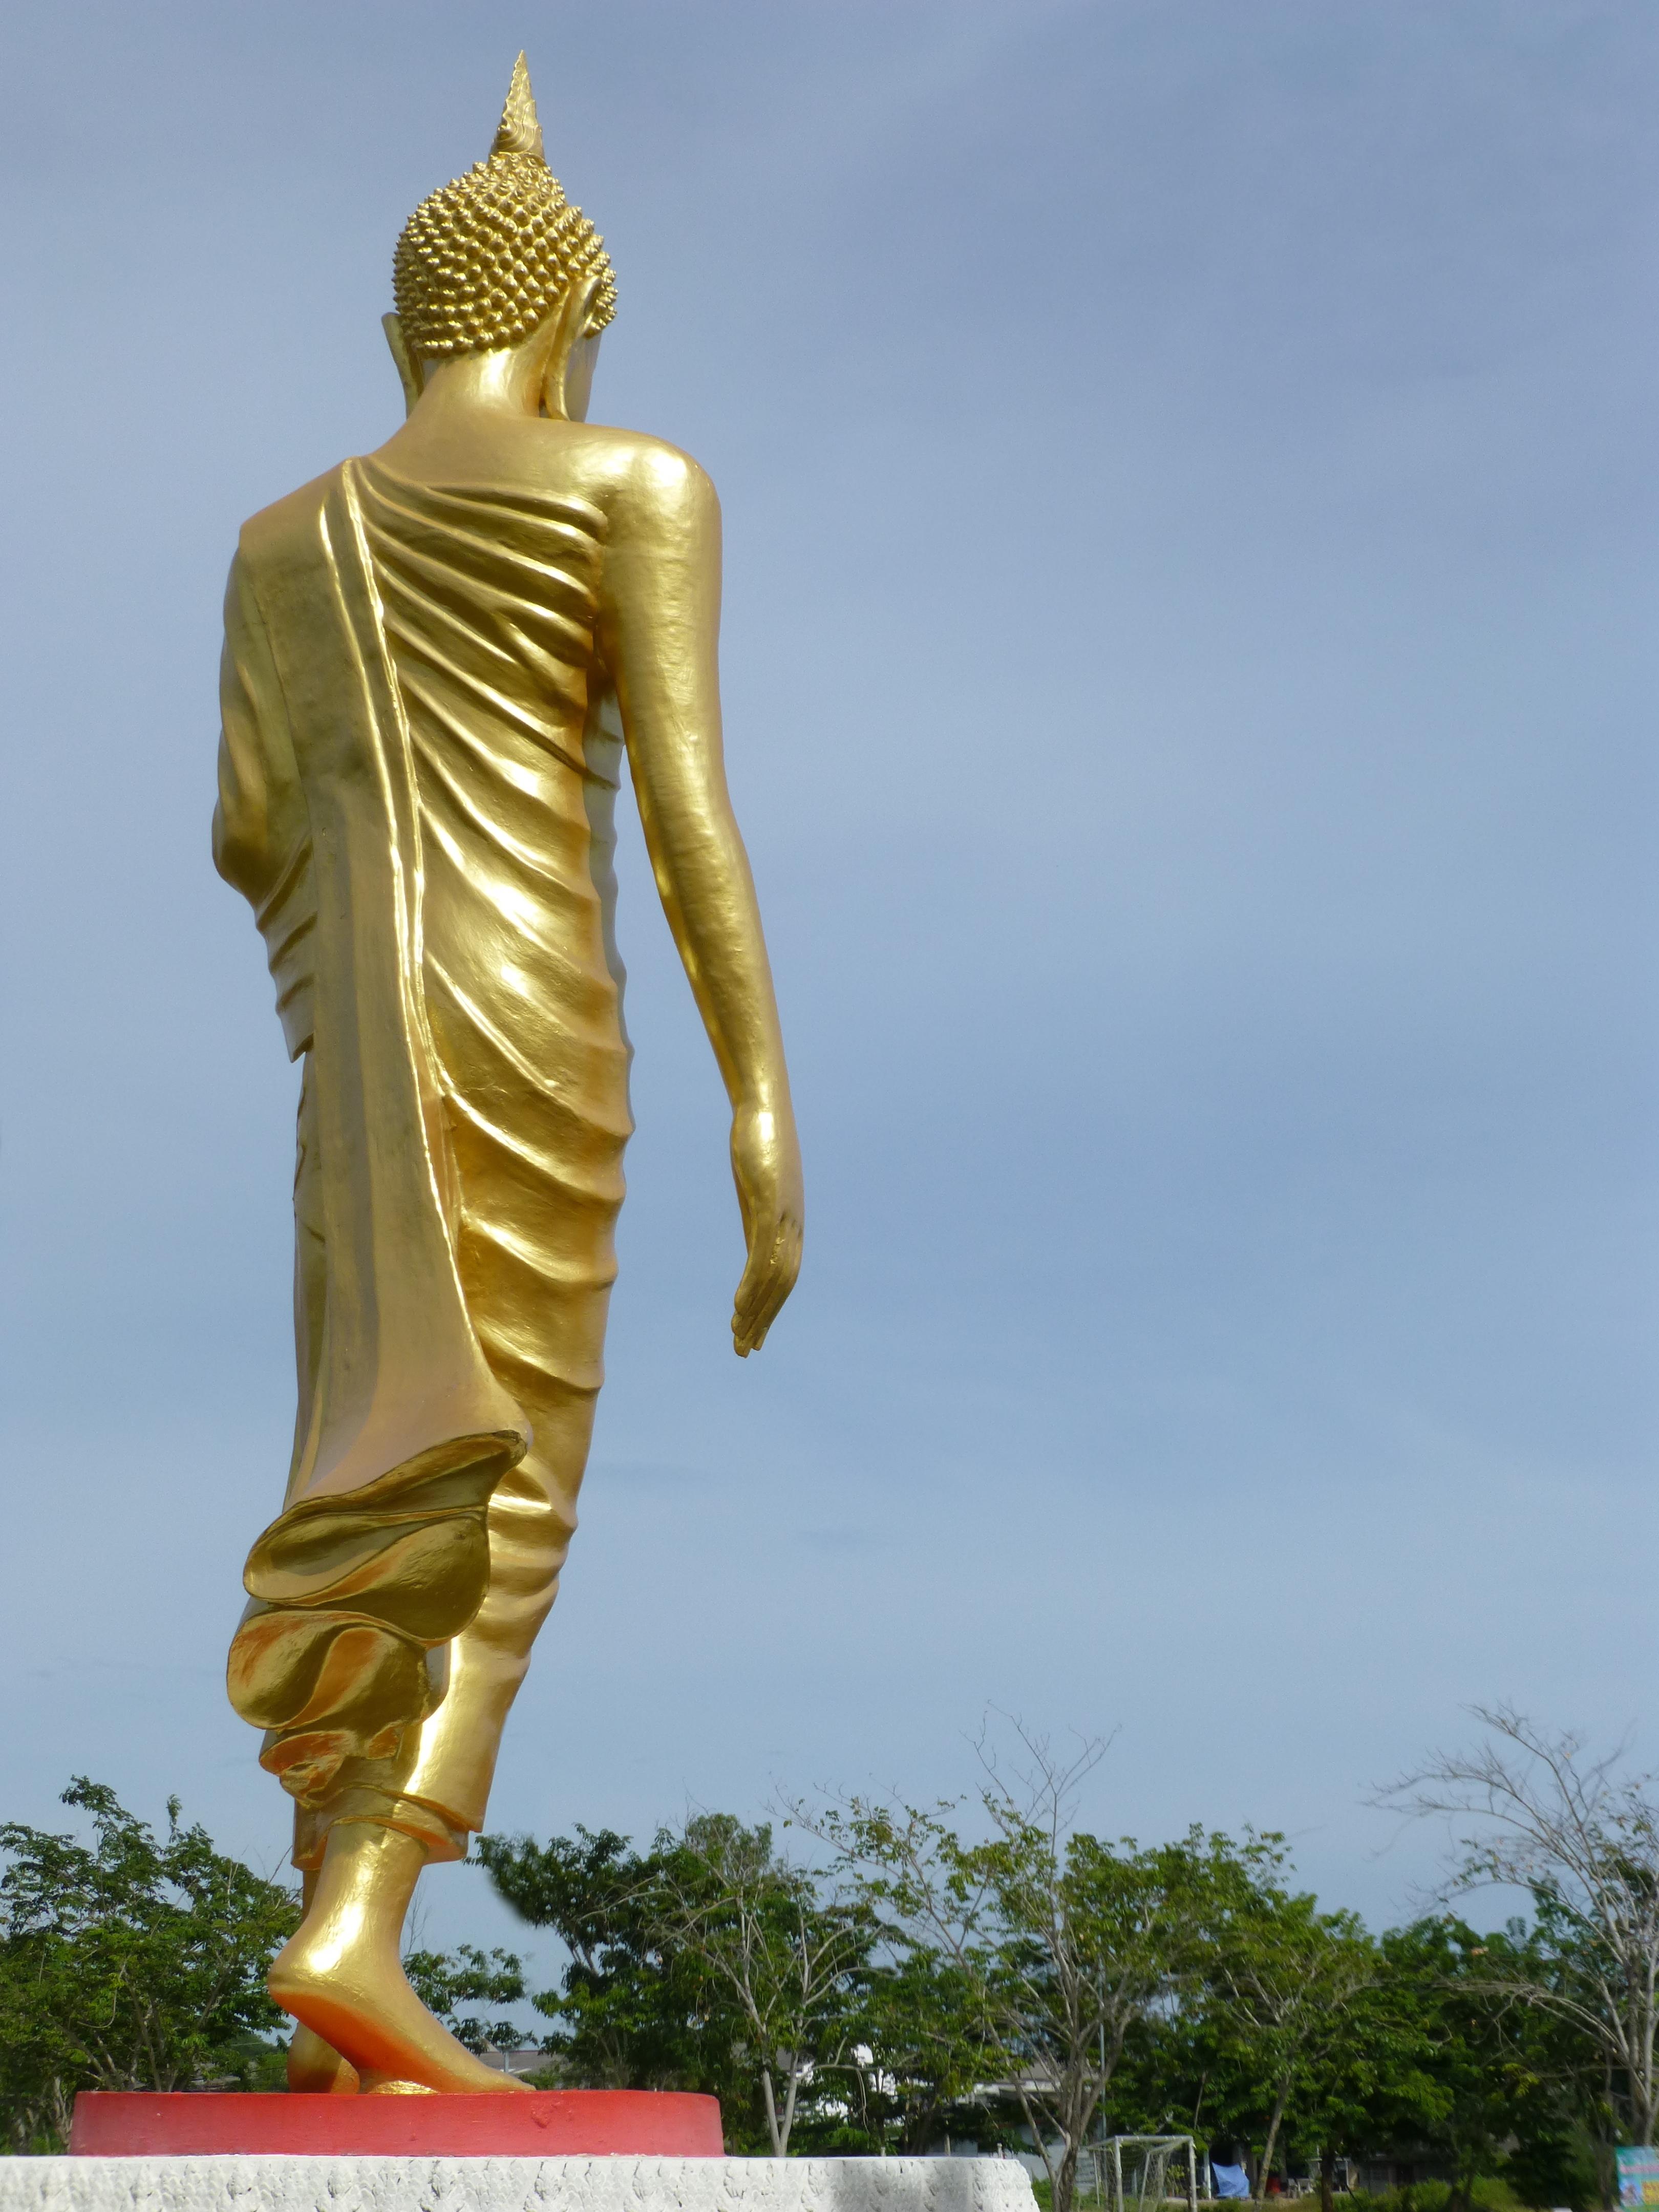 Songkhla Phranon Laem Pho Original besides Pho J besides F Cca B as well Pho C likewise Nguoi Thay. on pho